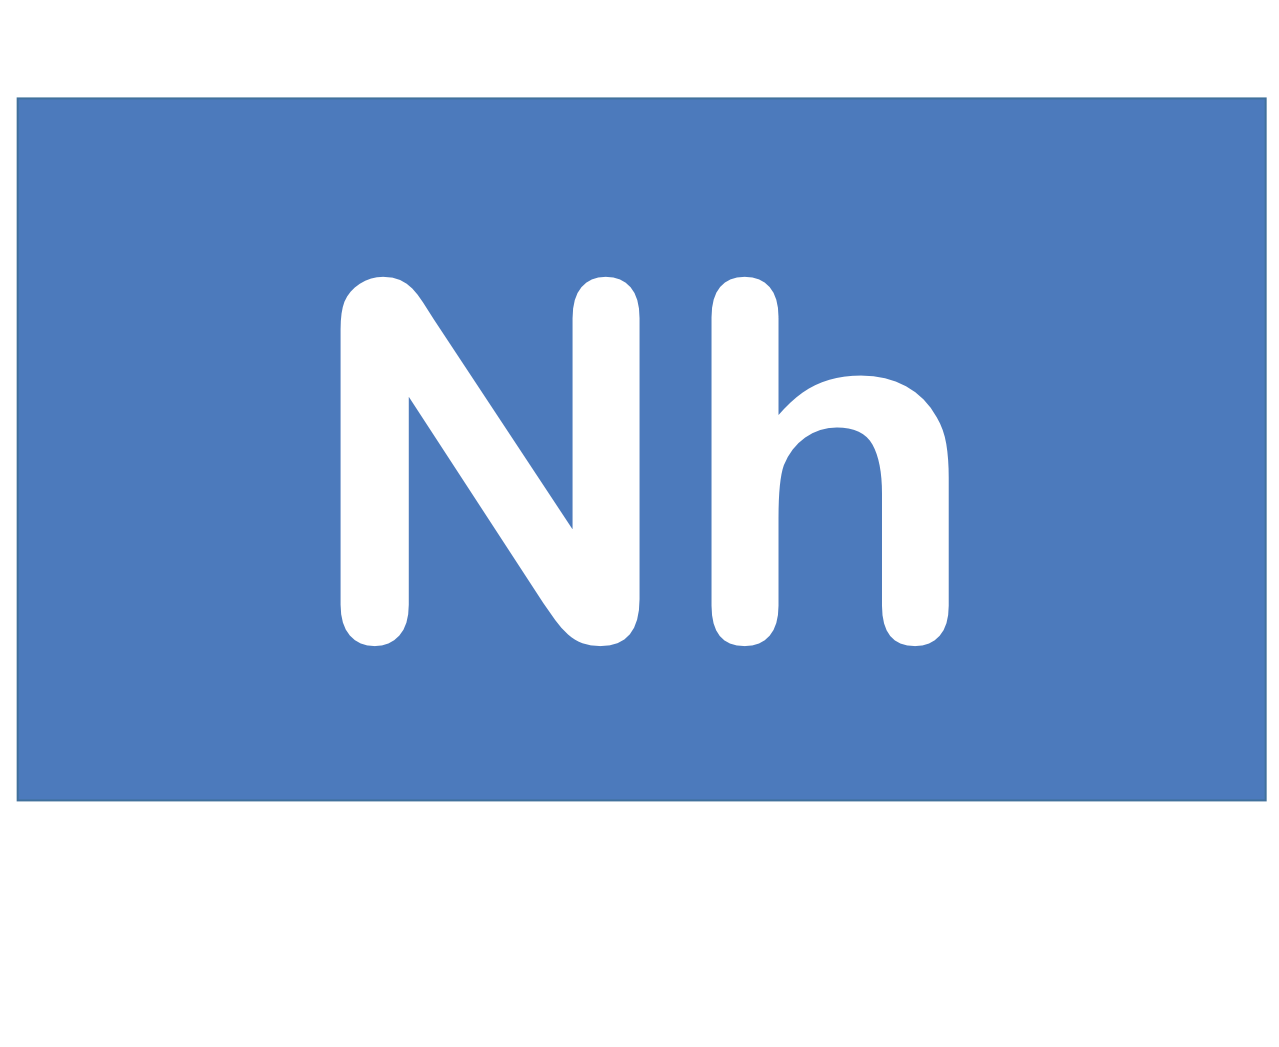 113 Nh ニホニウム Nihonium 元素 記号 周期表 化学 原子